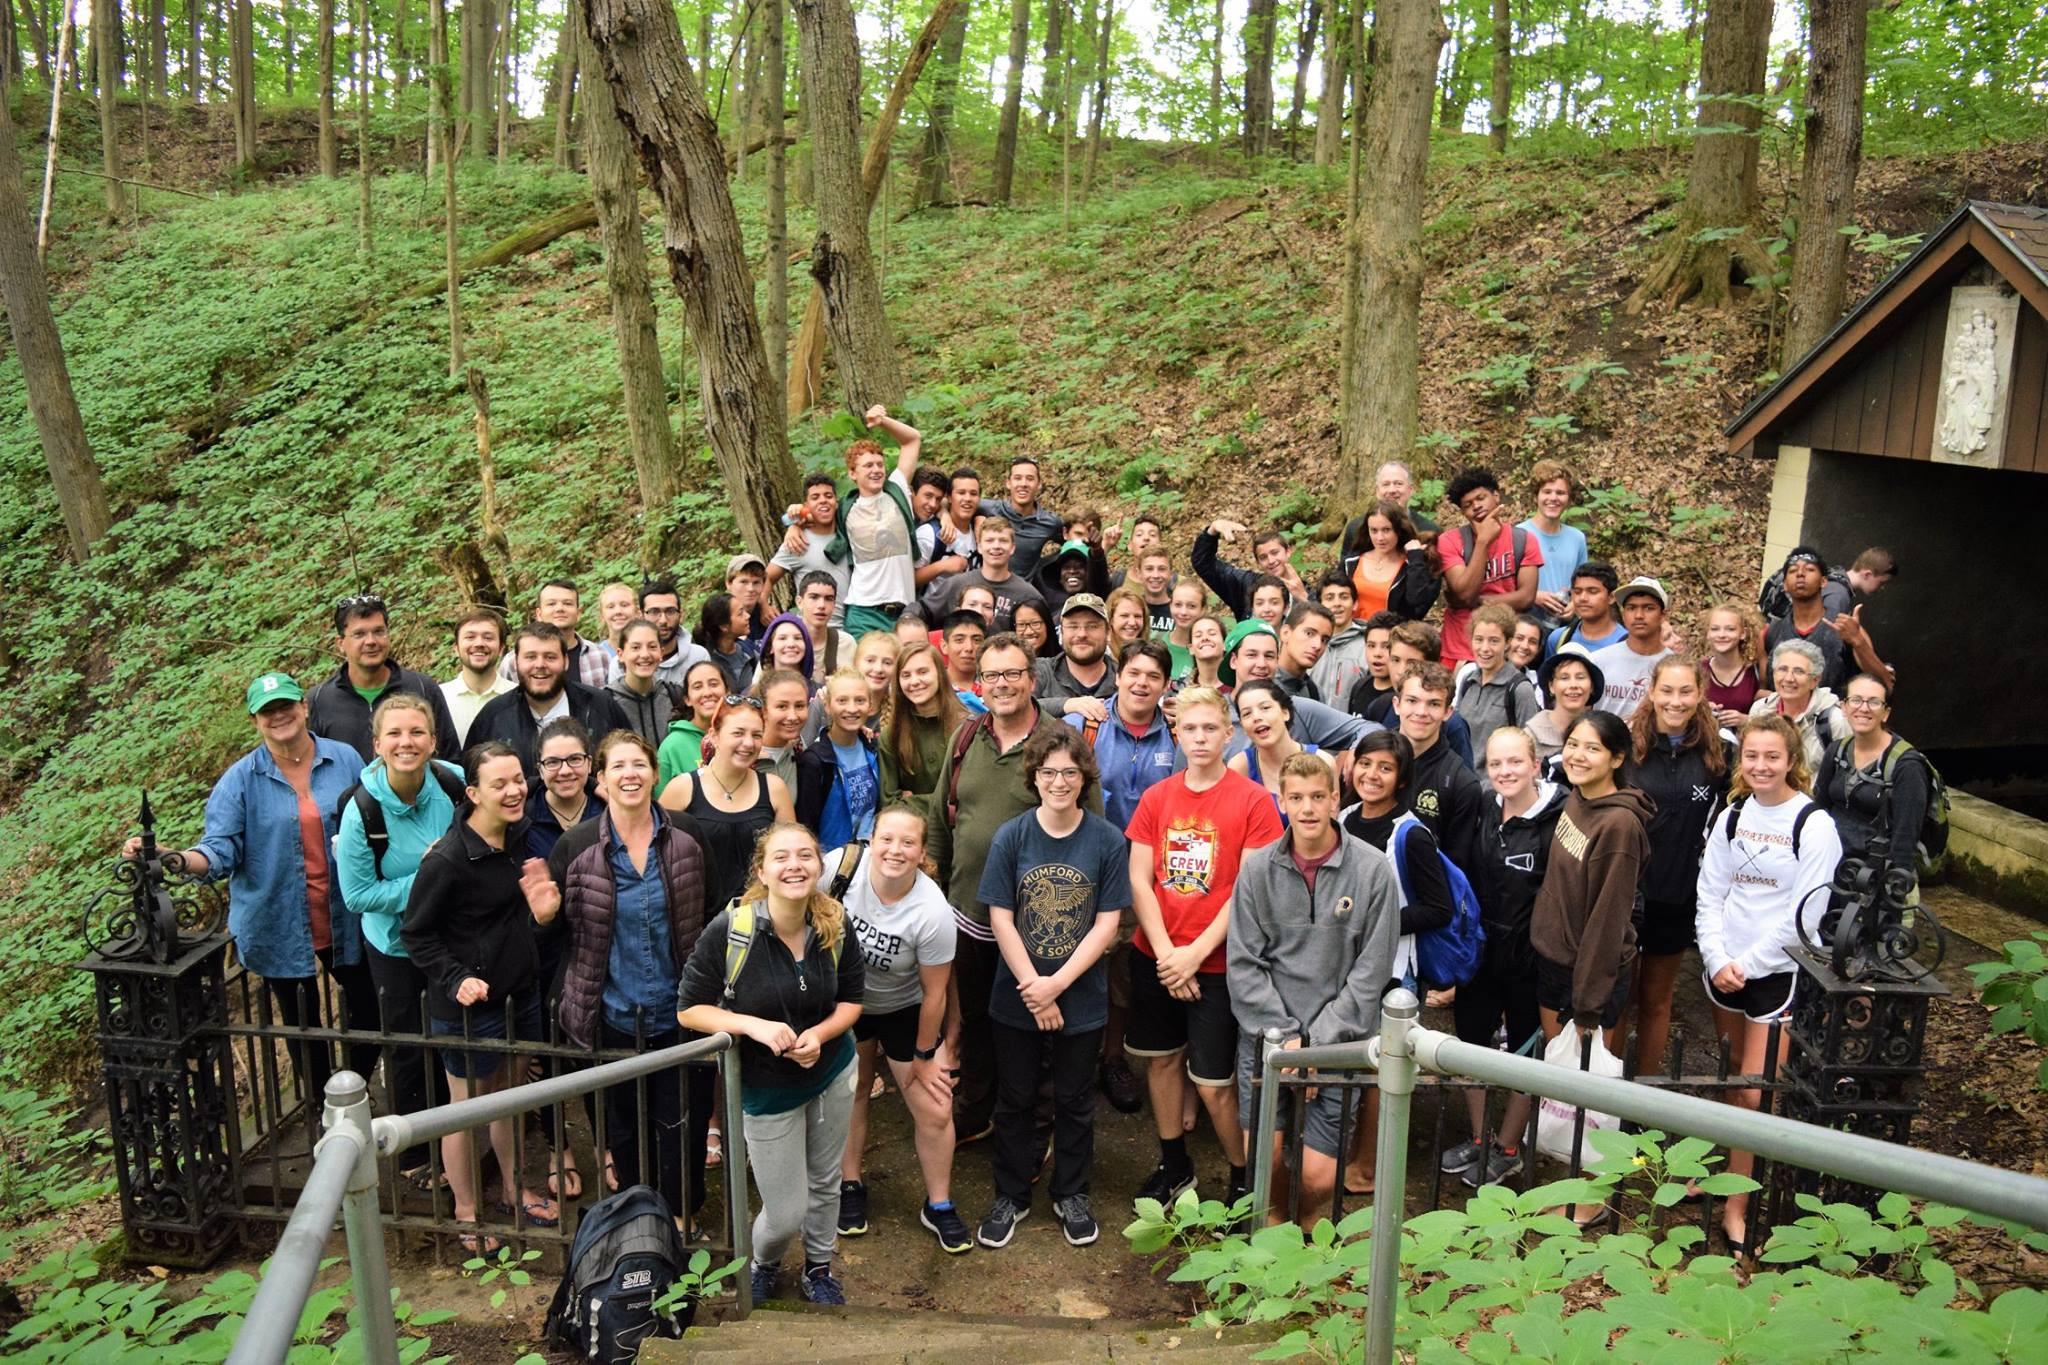 Tour Groups/Pilgrimages